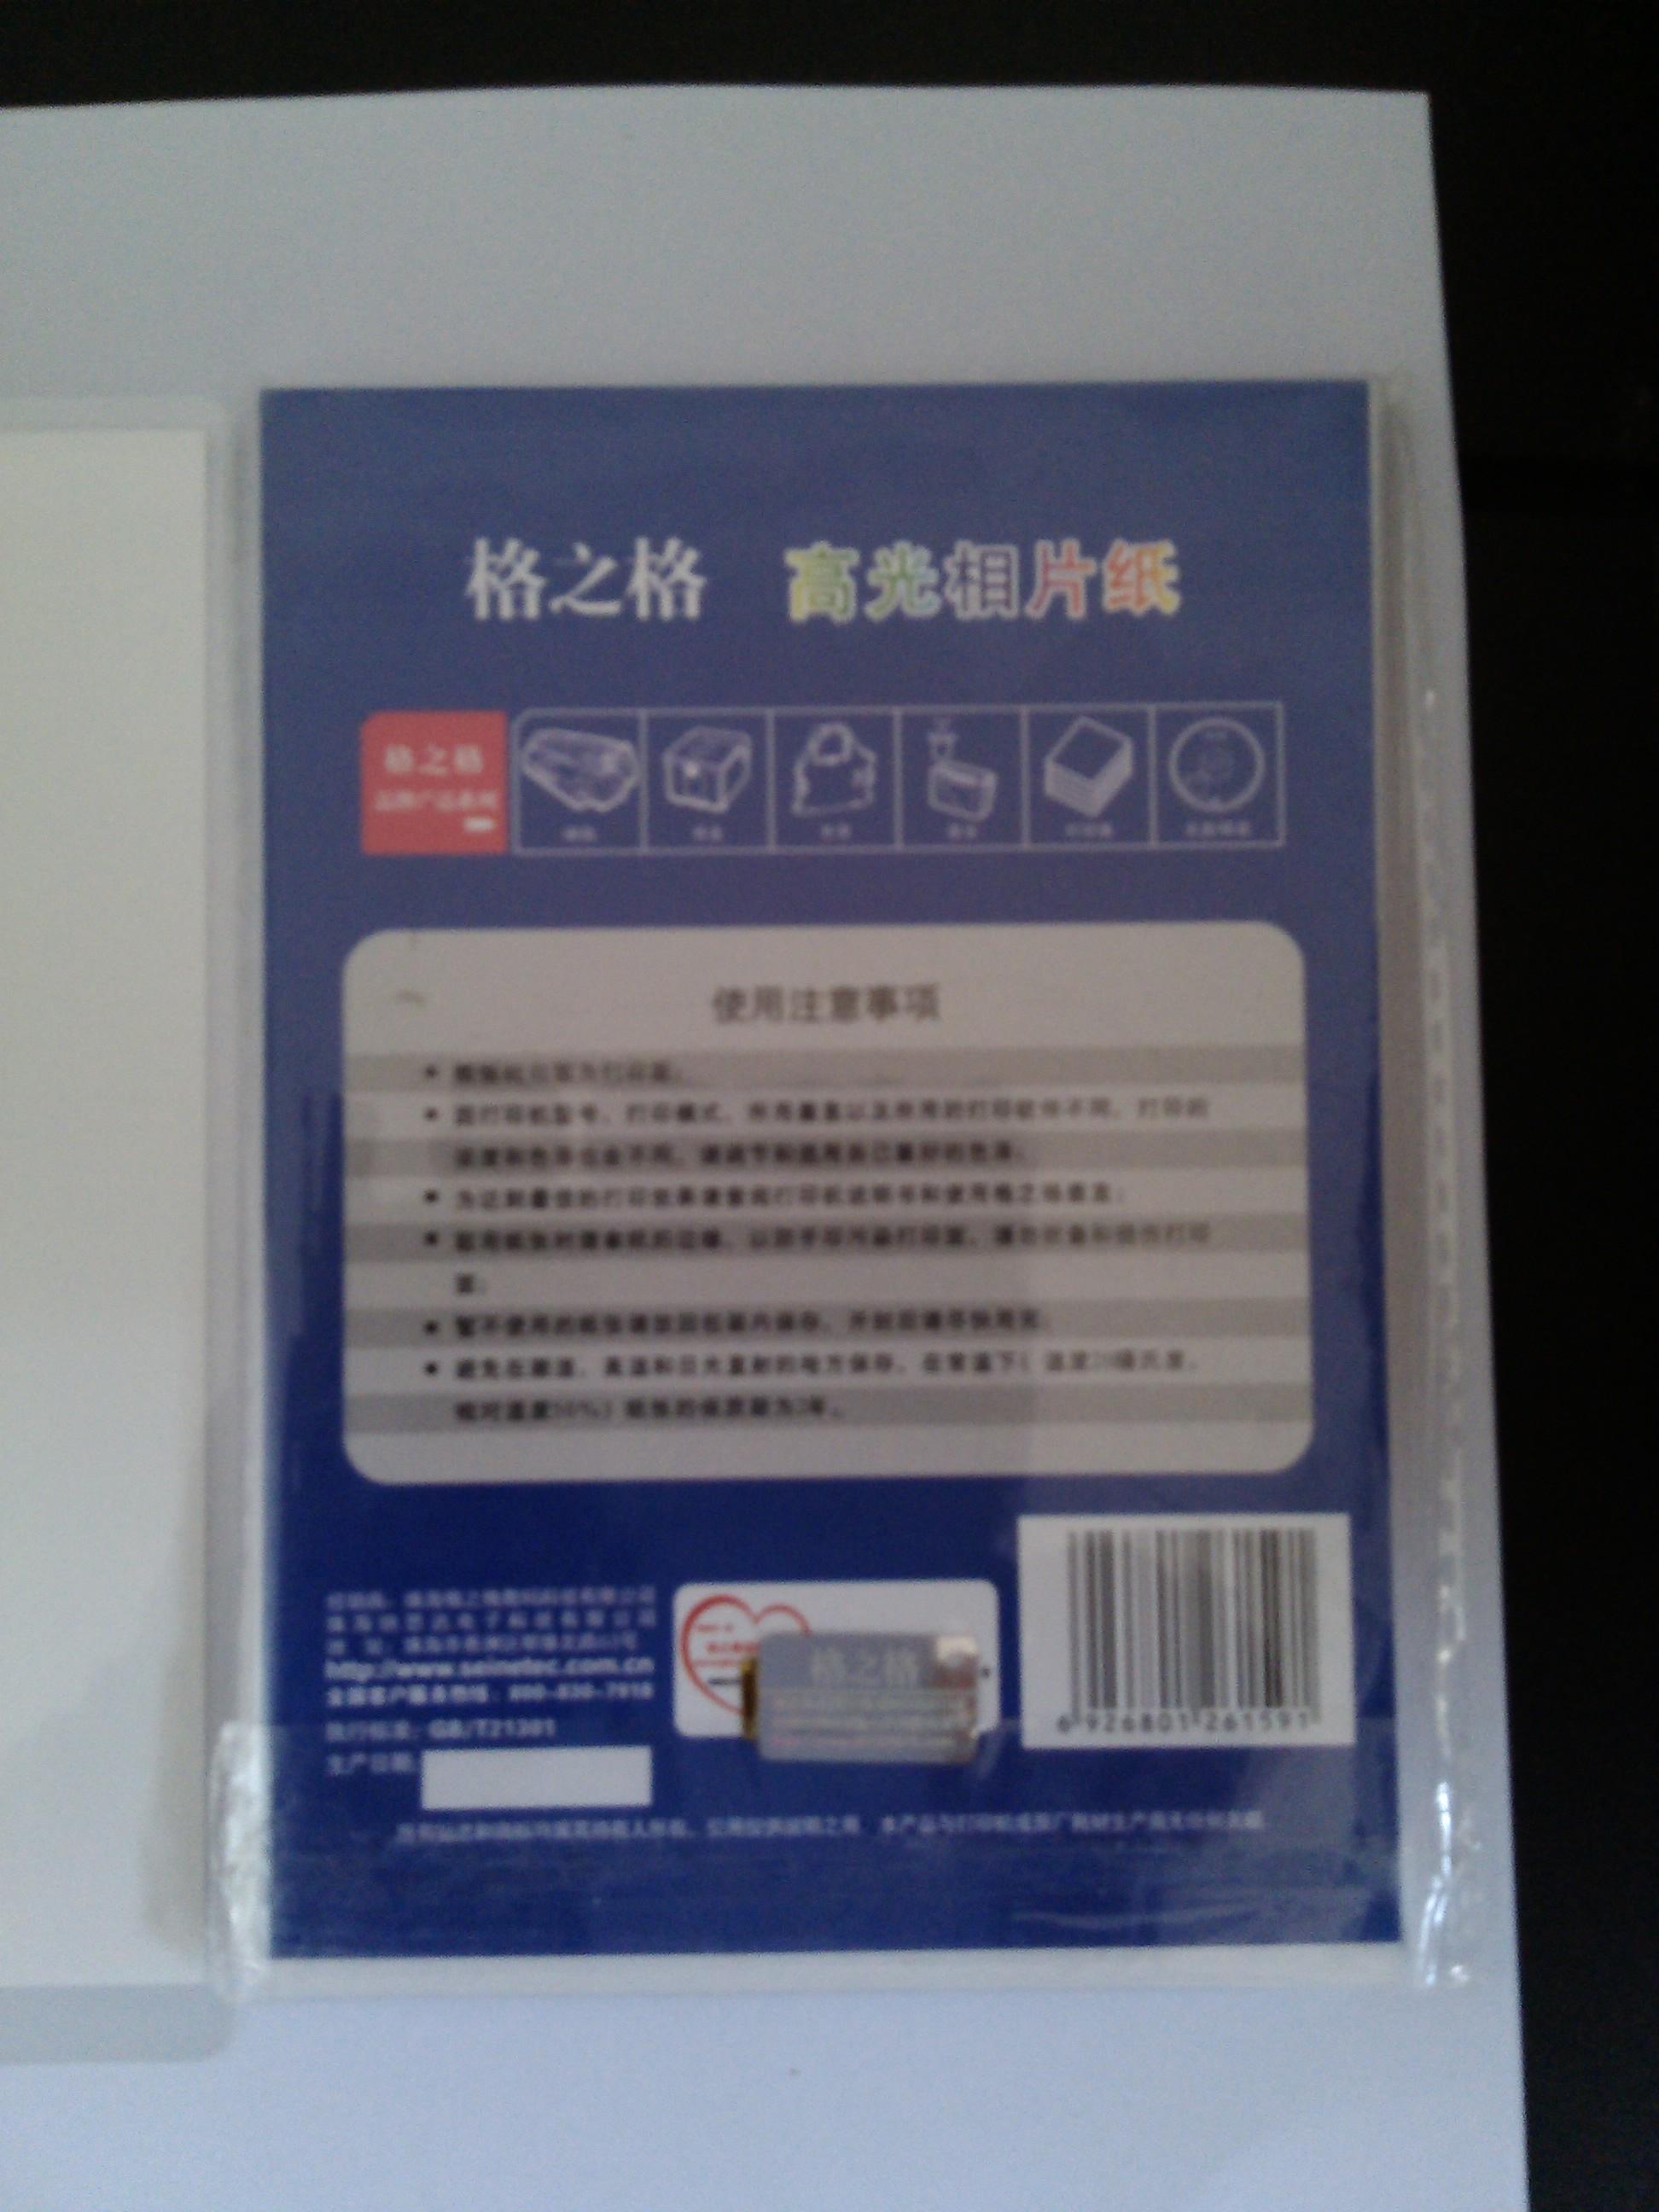 buy air max 1 og 00999436 store